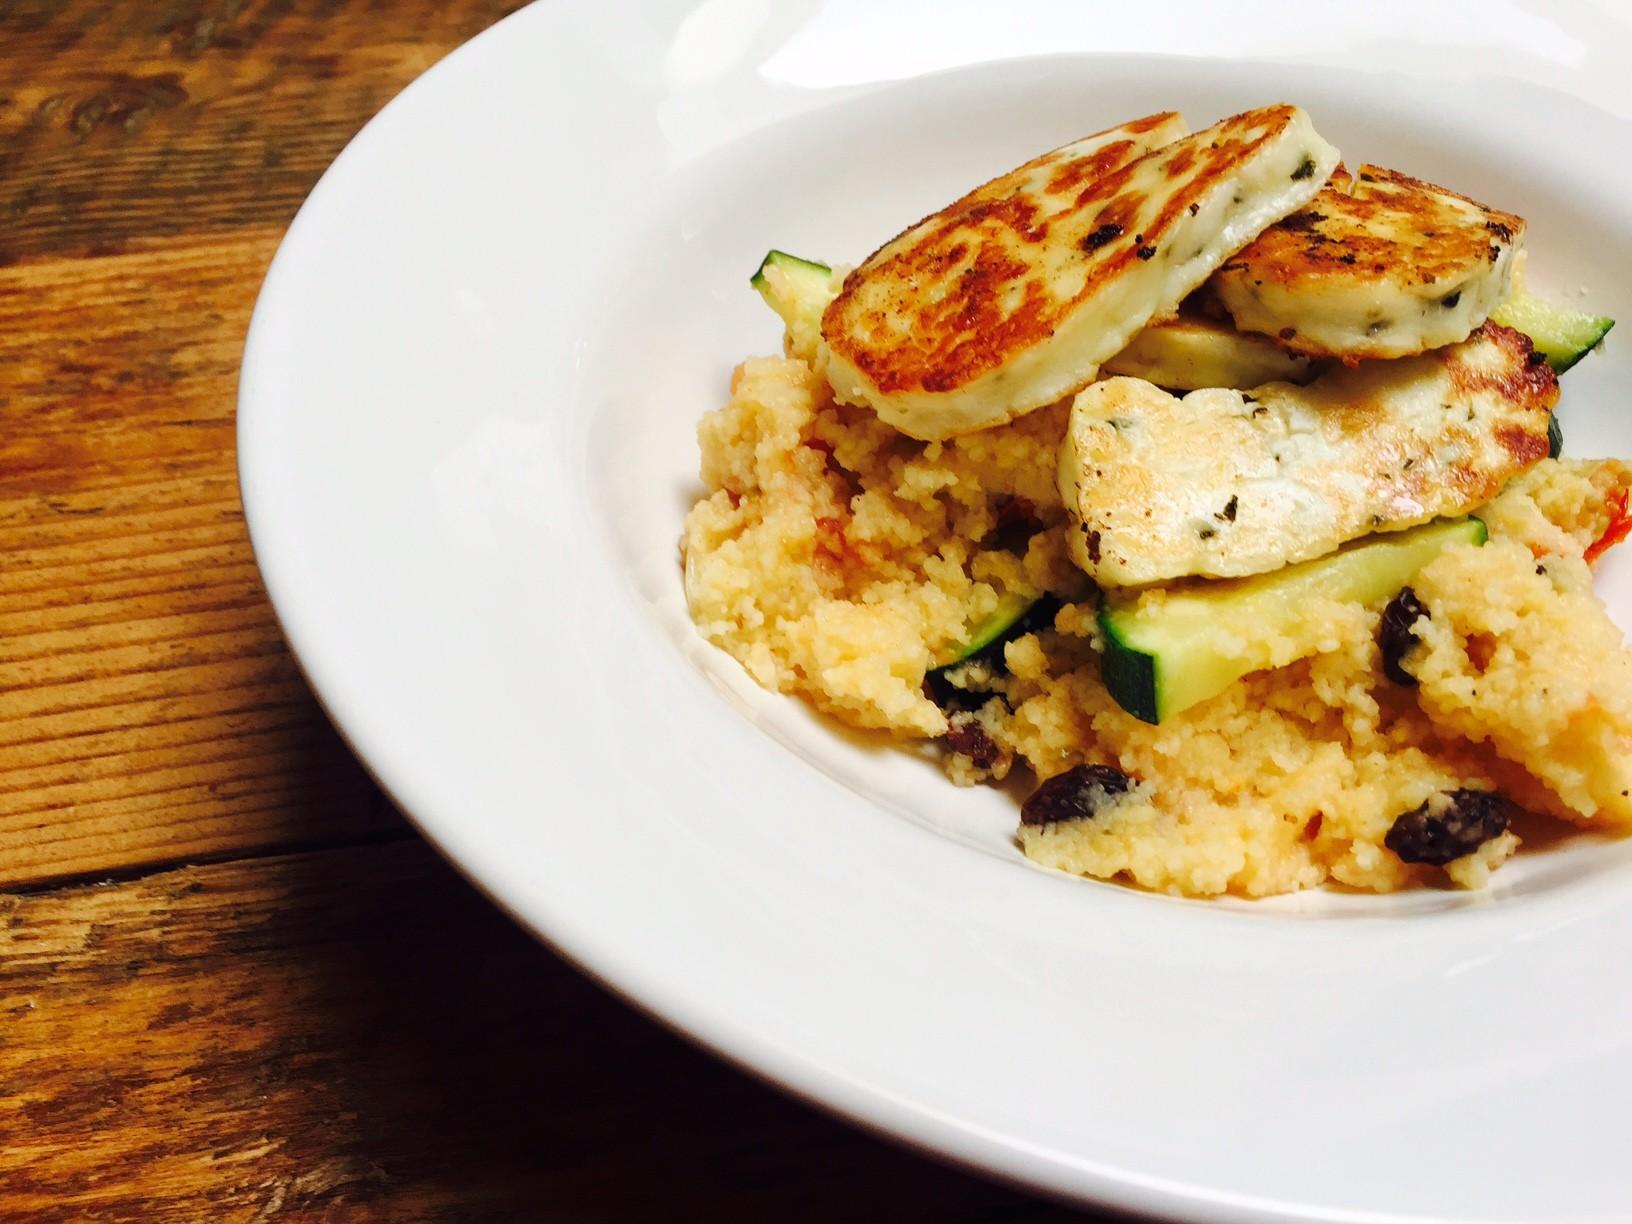 Couscoussalade met halloumi recept van Foodblog Foodinista